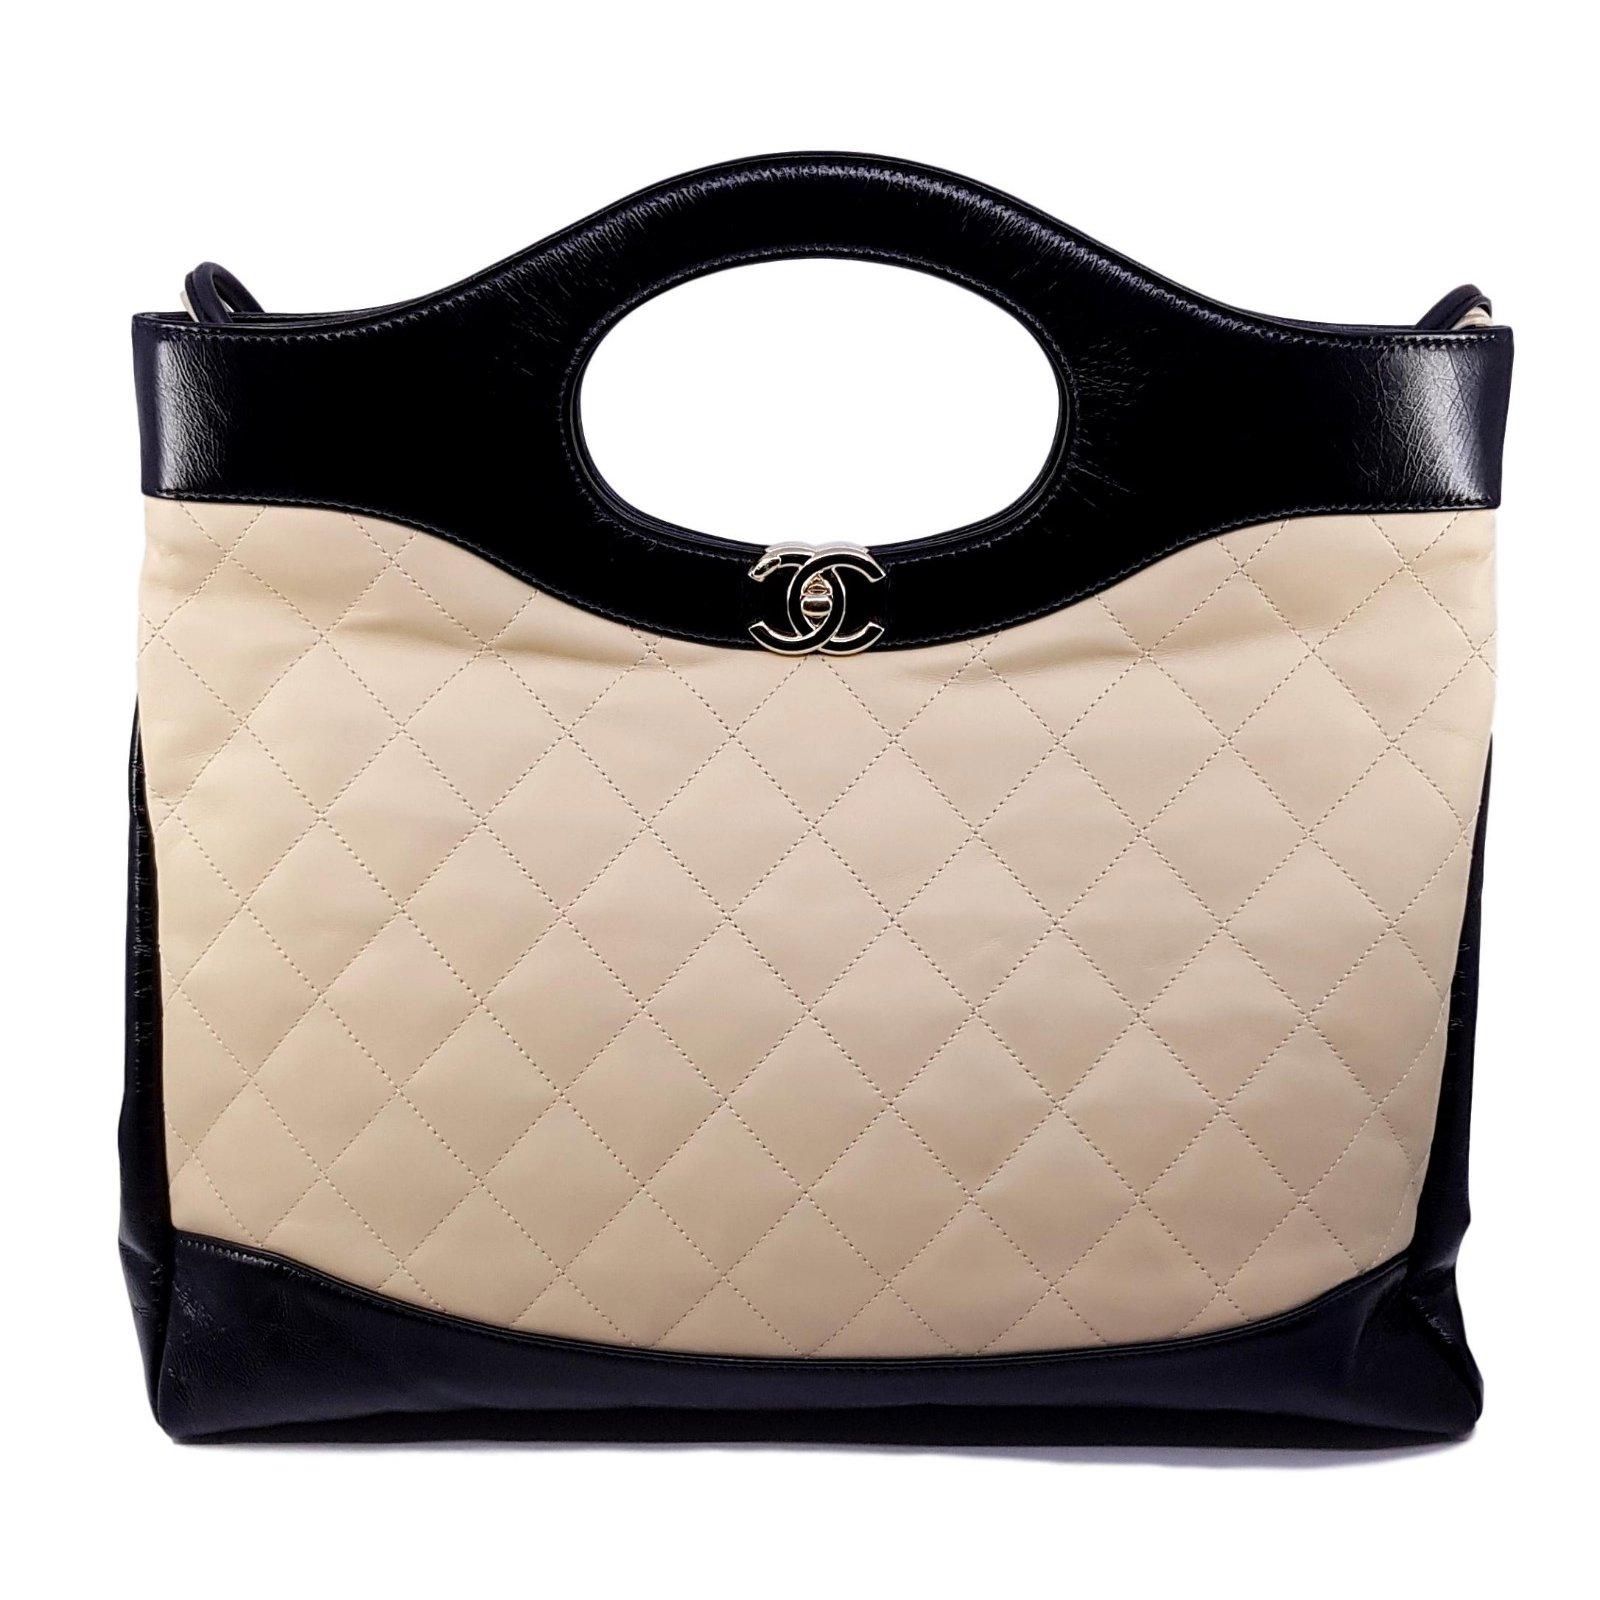 42c13c629c Large CHANEL shopping bag 31